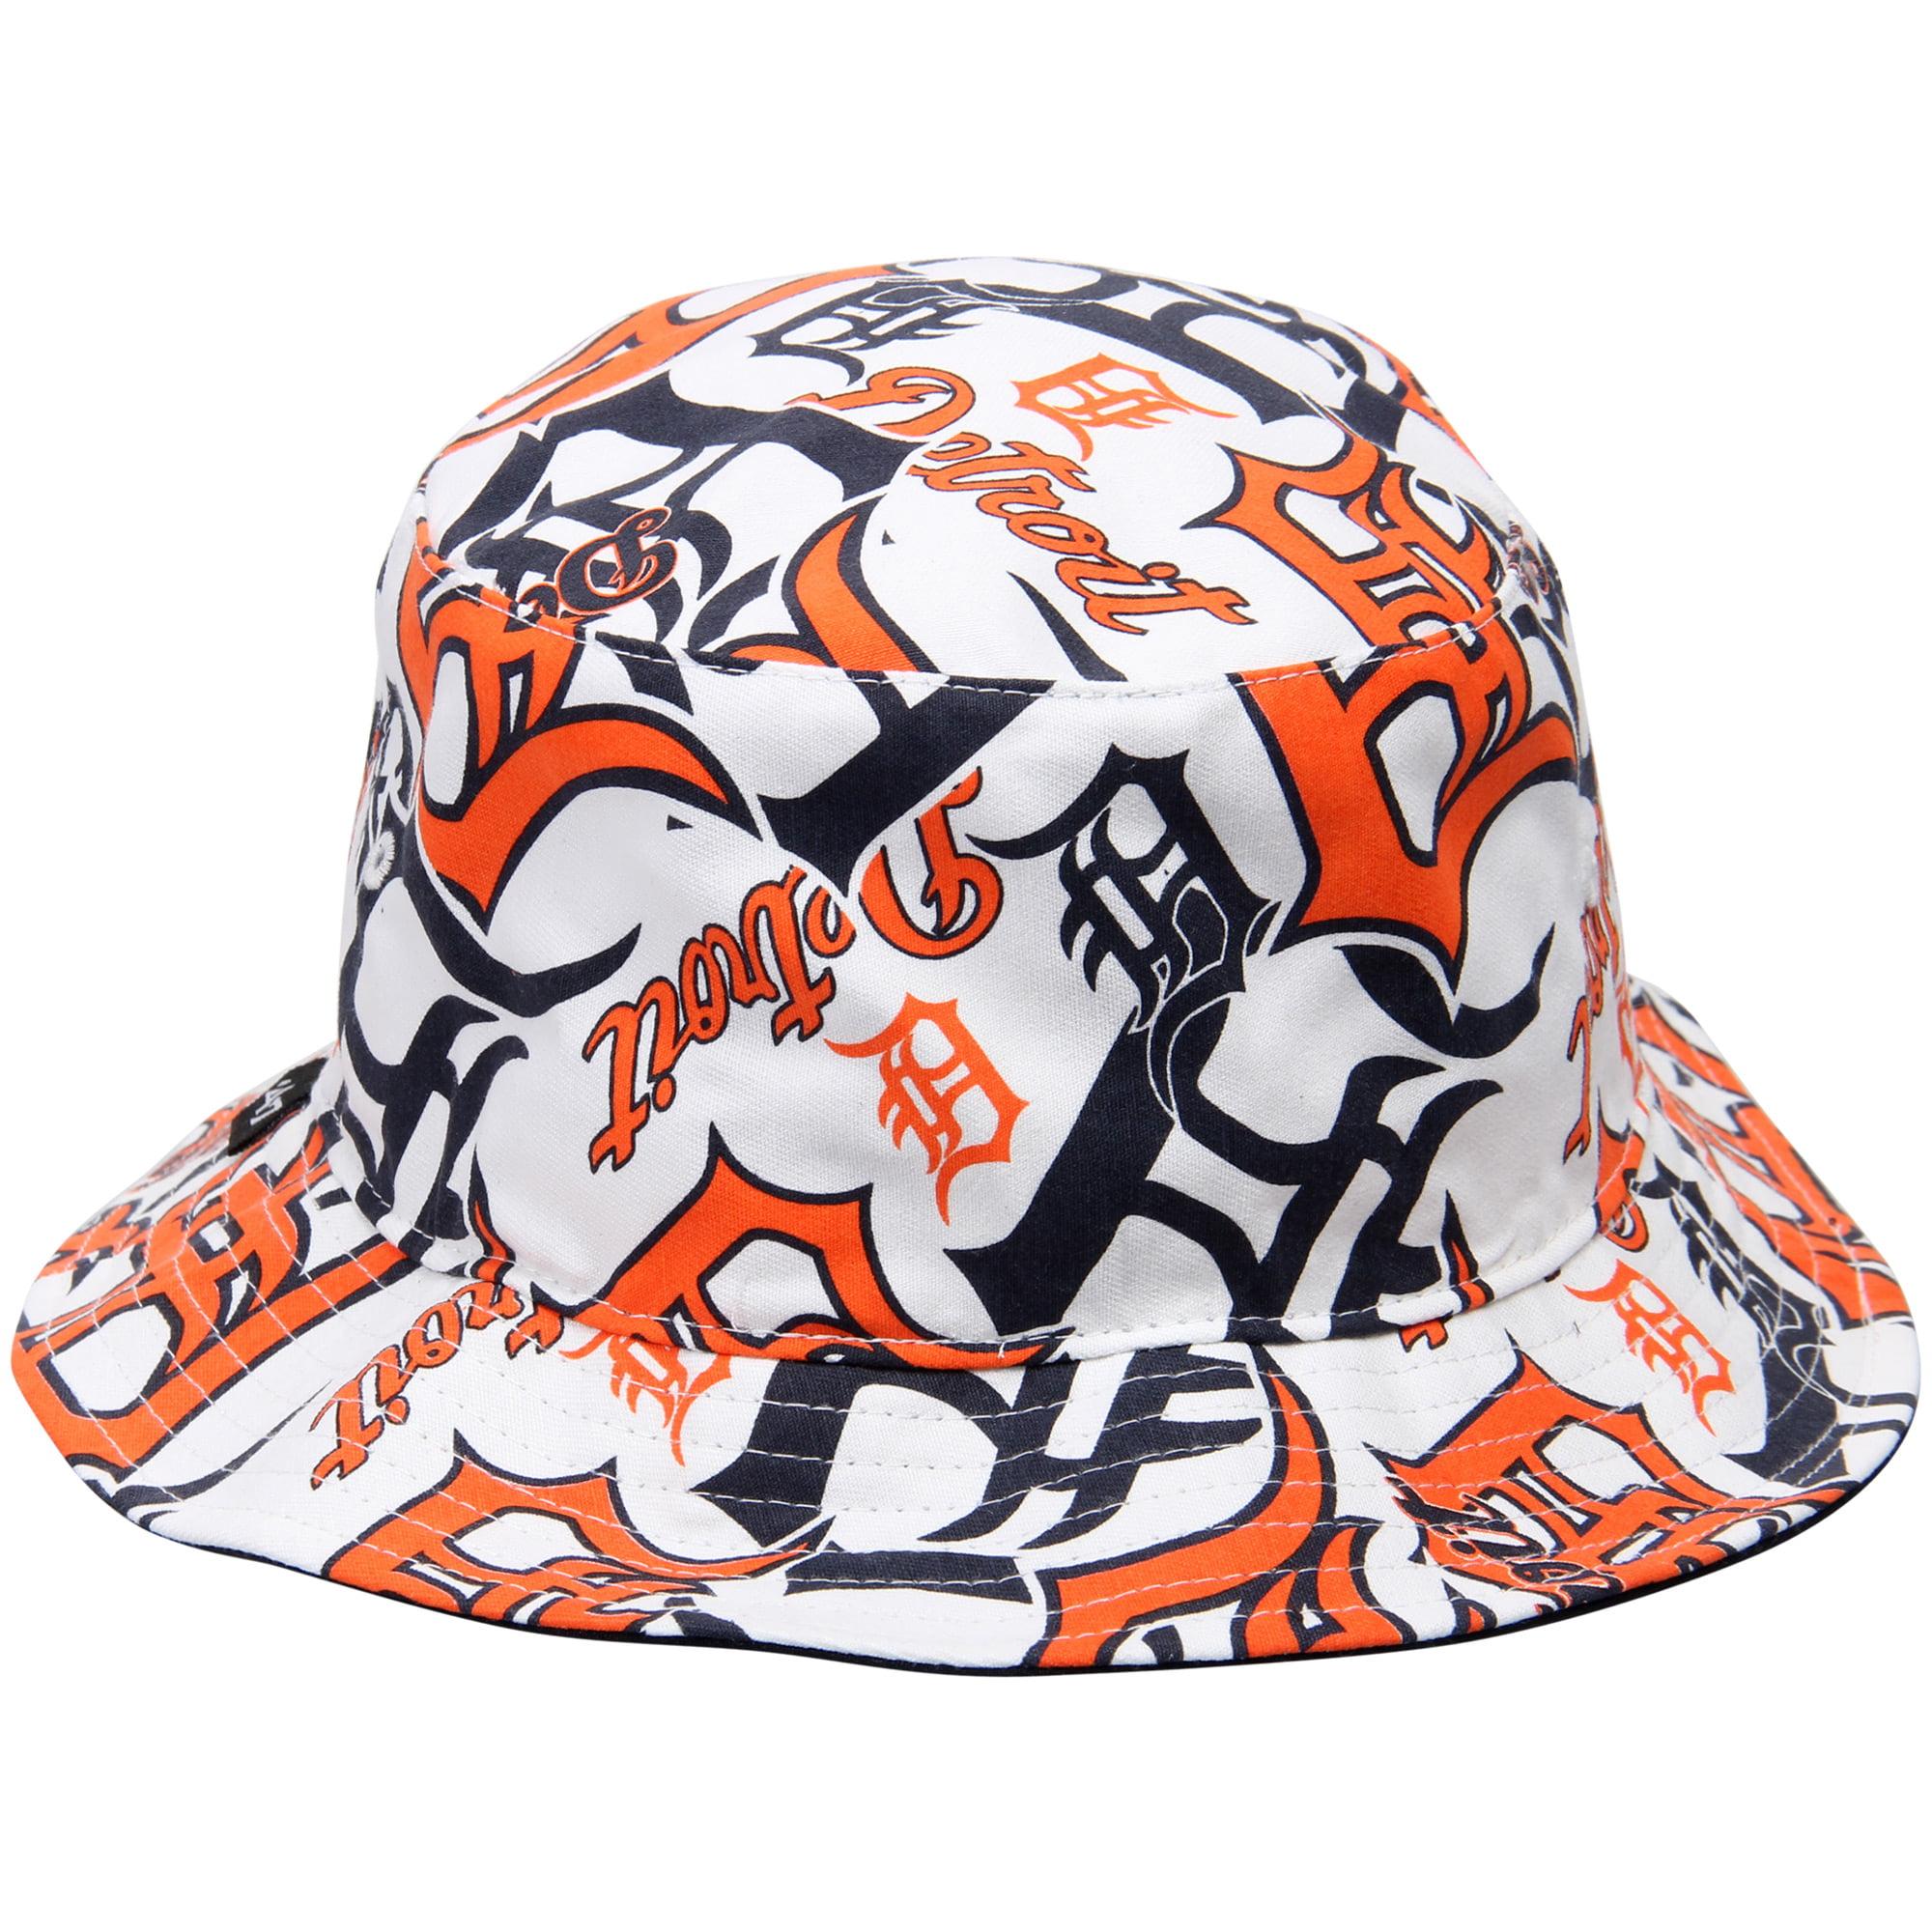 2c0a44cc12631 Detroit Tigers  47 Bravado Bucket Hat - White - Walmart.com